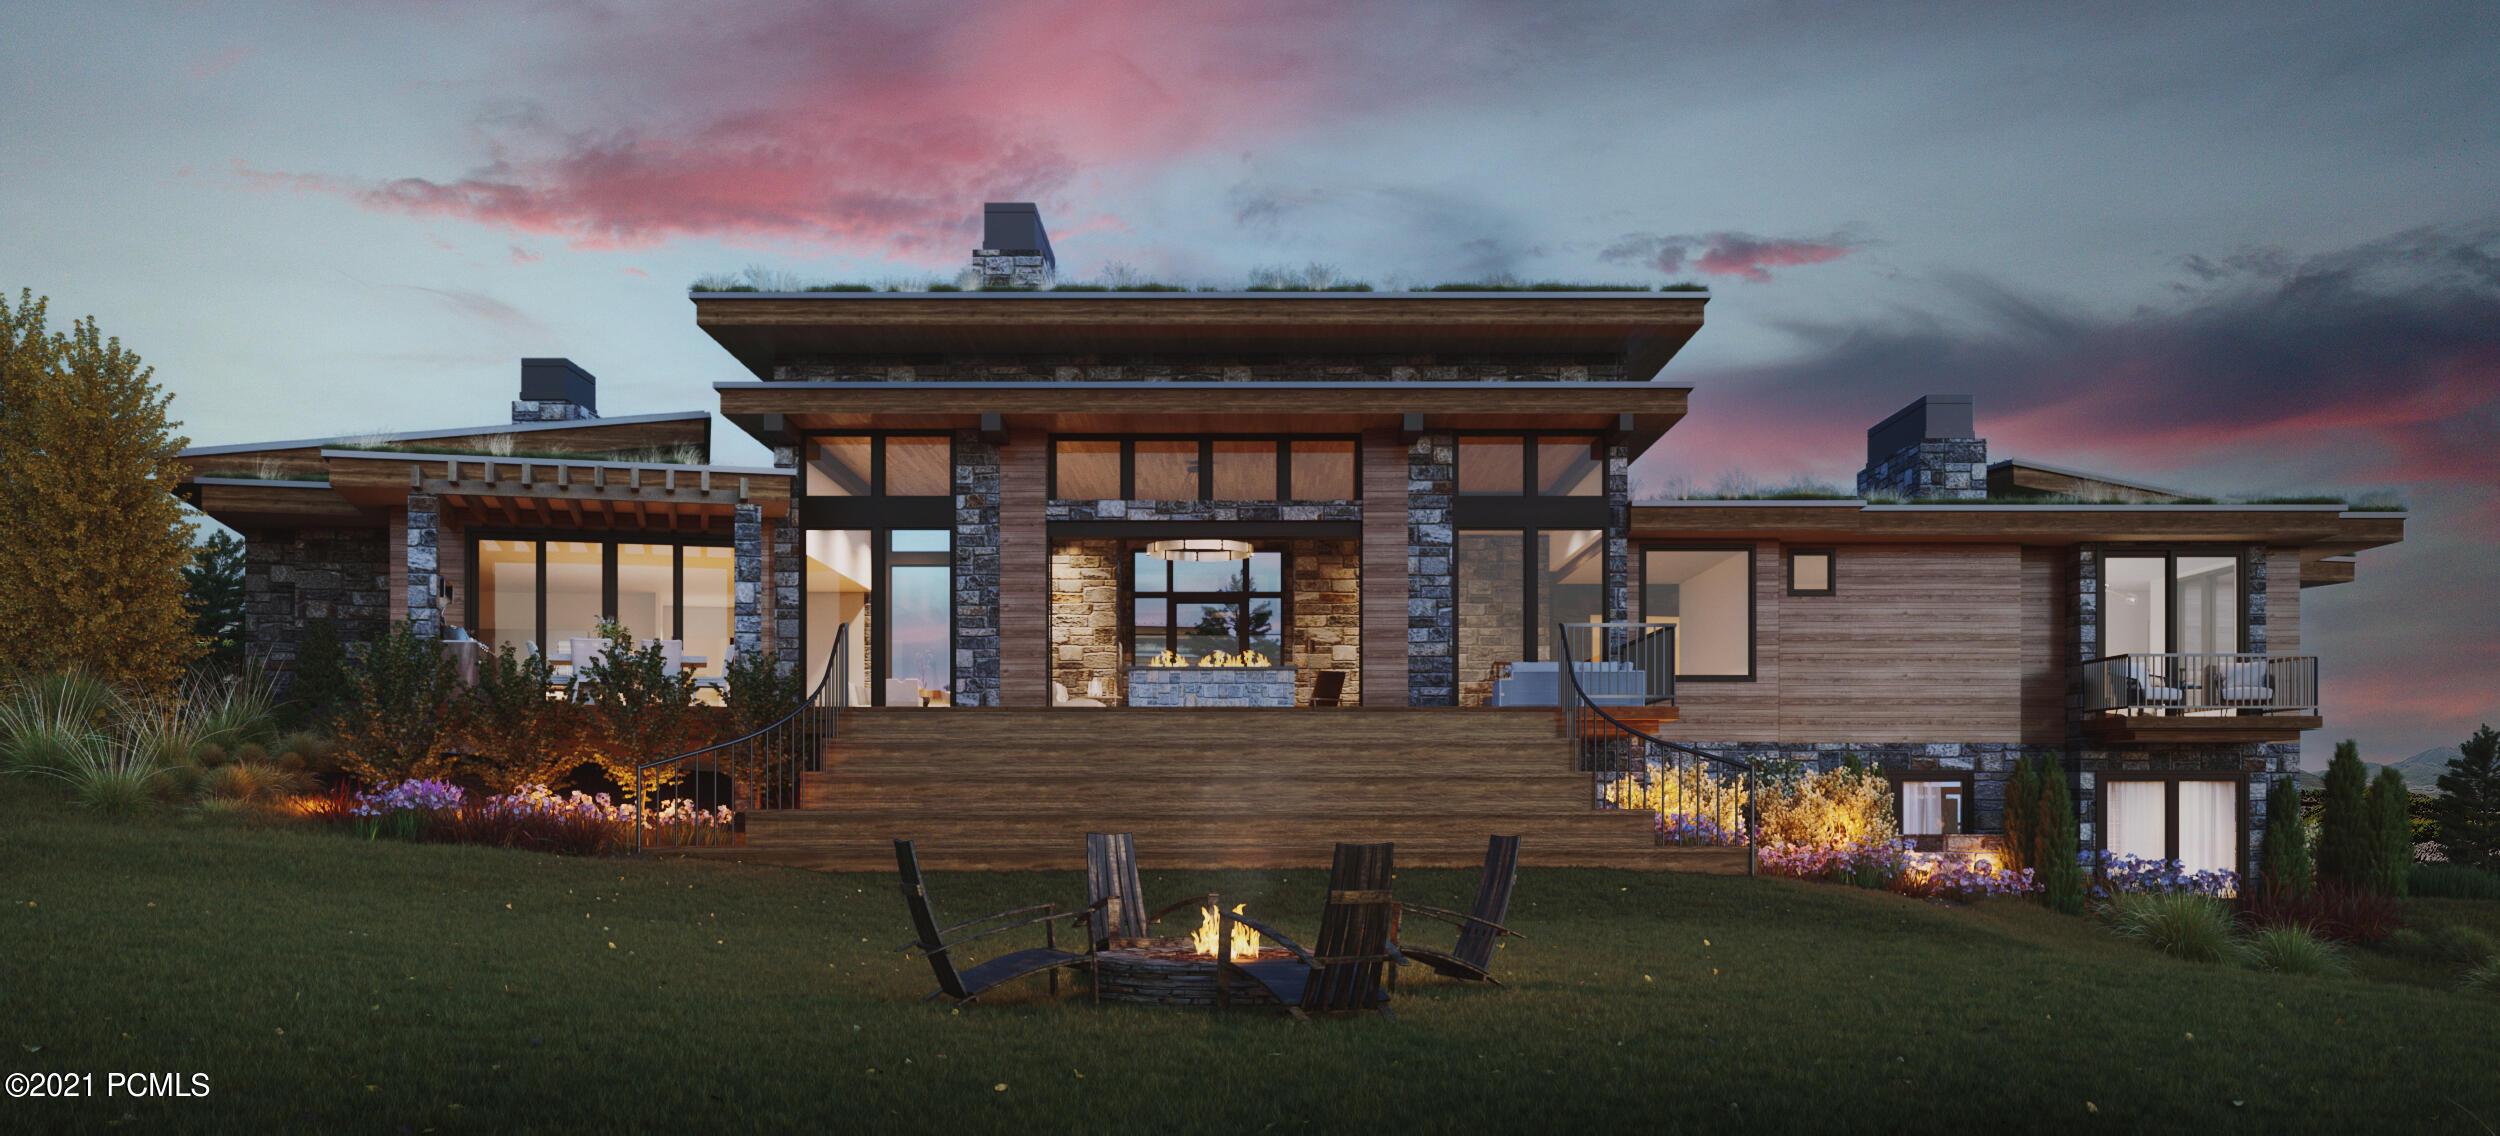 8710 Promontory Ridge, Park City, Utah 84098, 6 Bedrooms Bedrooms, ,9 BathroomsBathrooms,Single Family,For Sale,Promontory,12103414